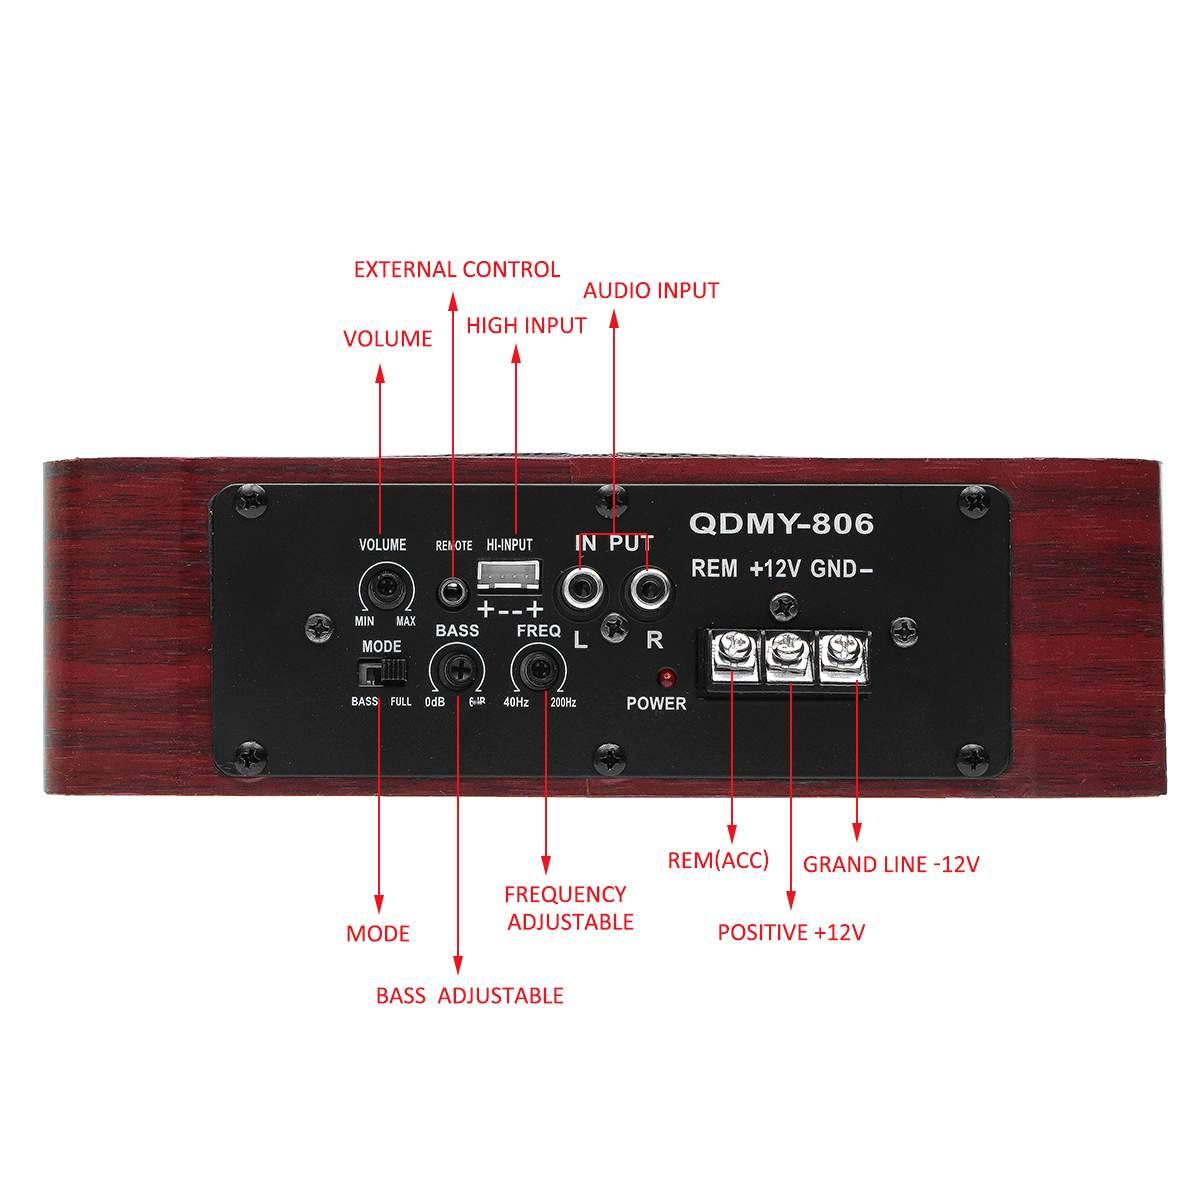 600 W 8 Zoll Holz Ultra-dünne Auto Stereo Subwoofer Auto Audio Auto Lautsprecher Universal Lautsprecher Subwoofer Auto Unter sitz Gehäuse